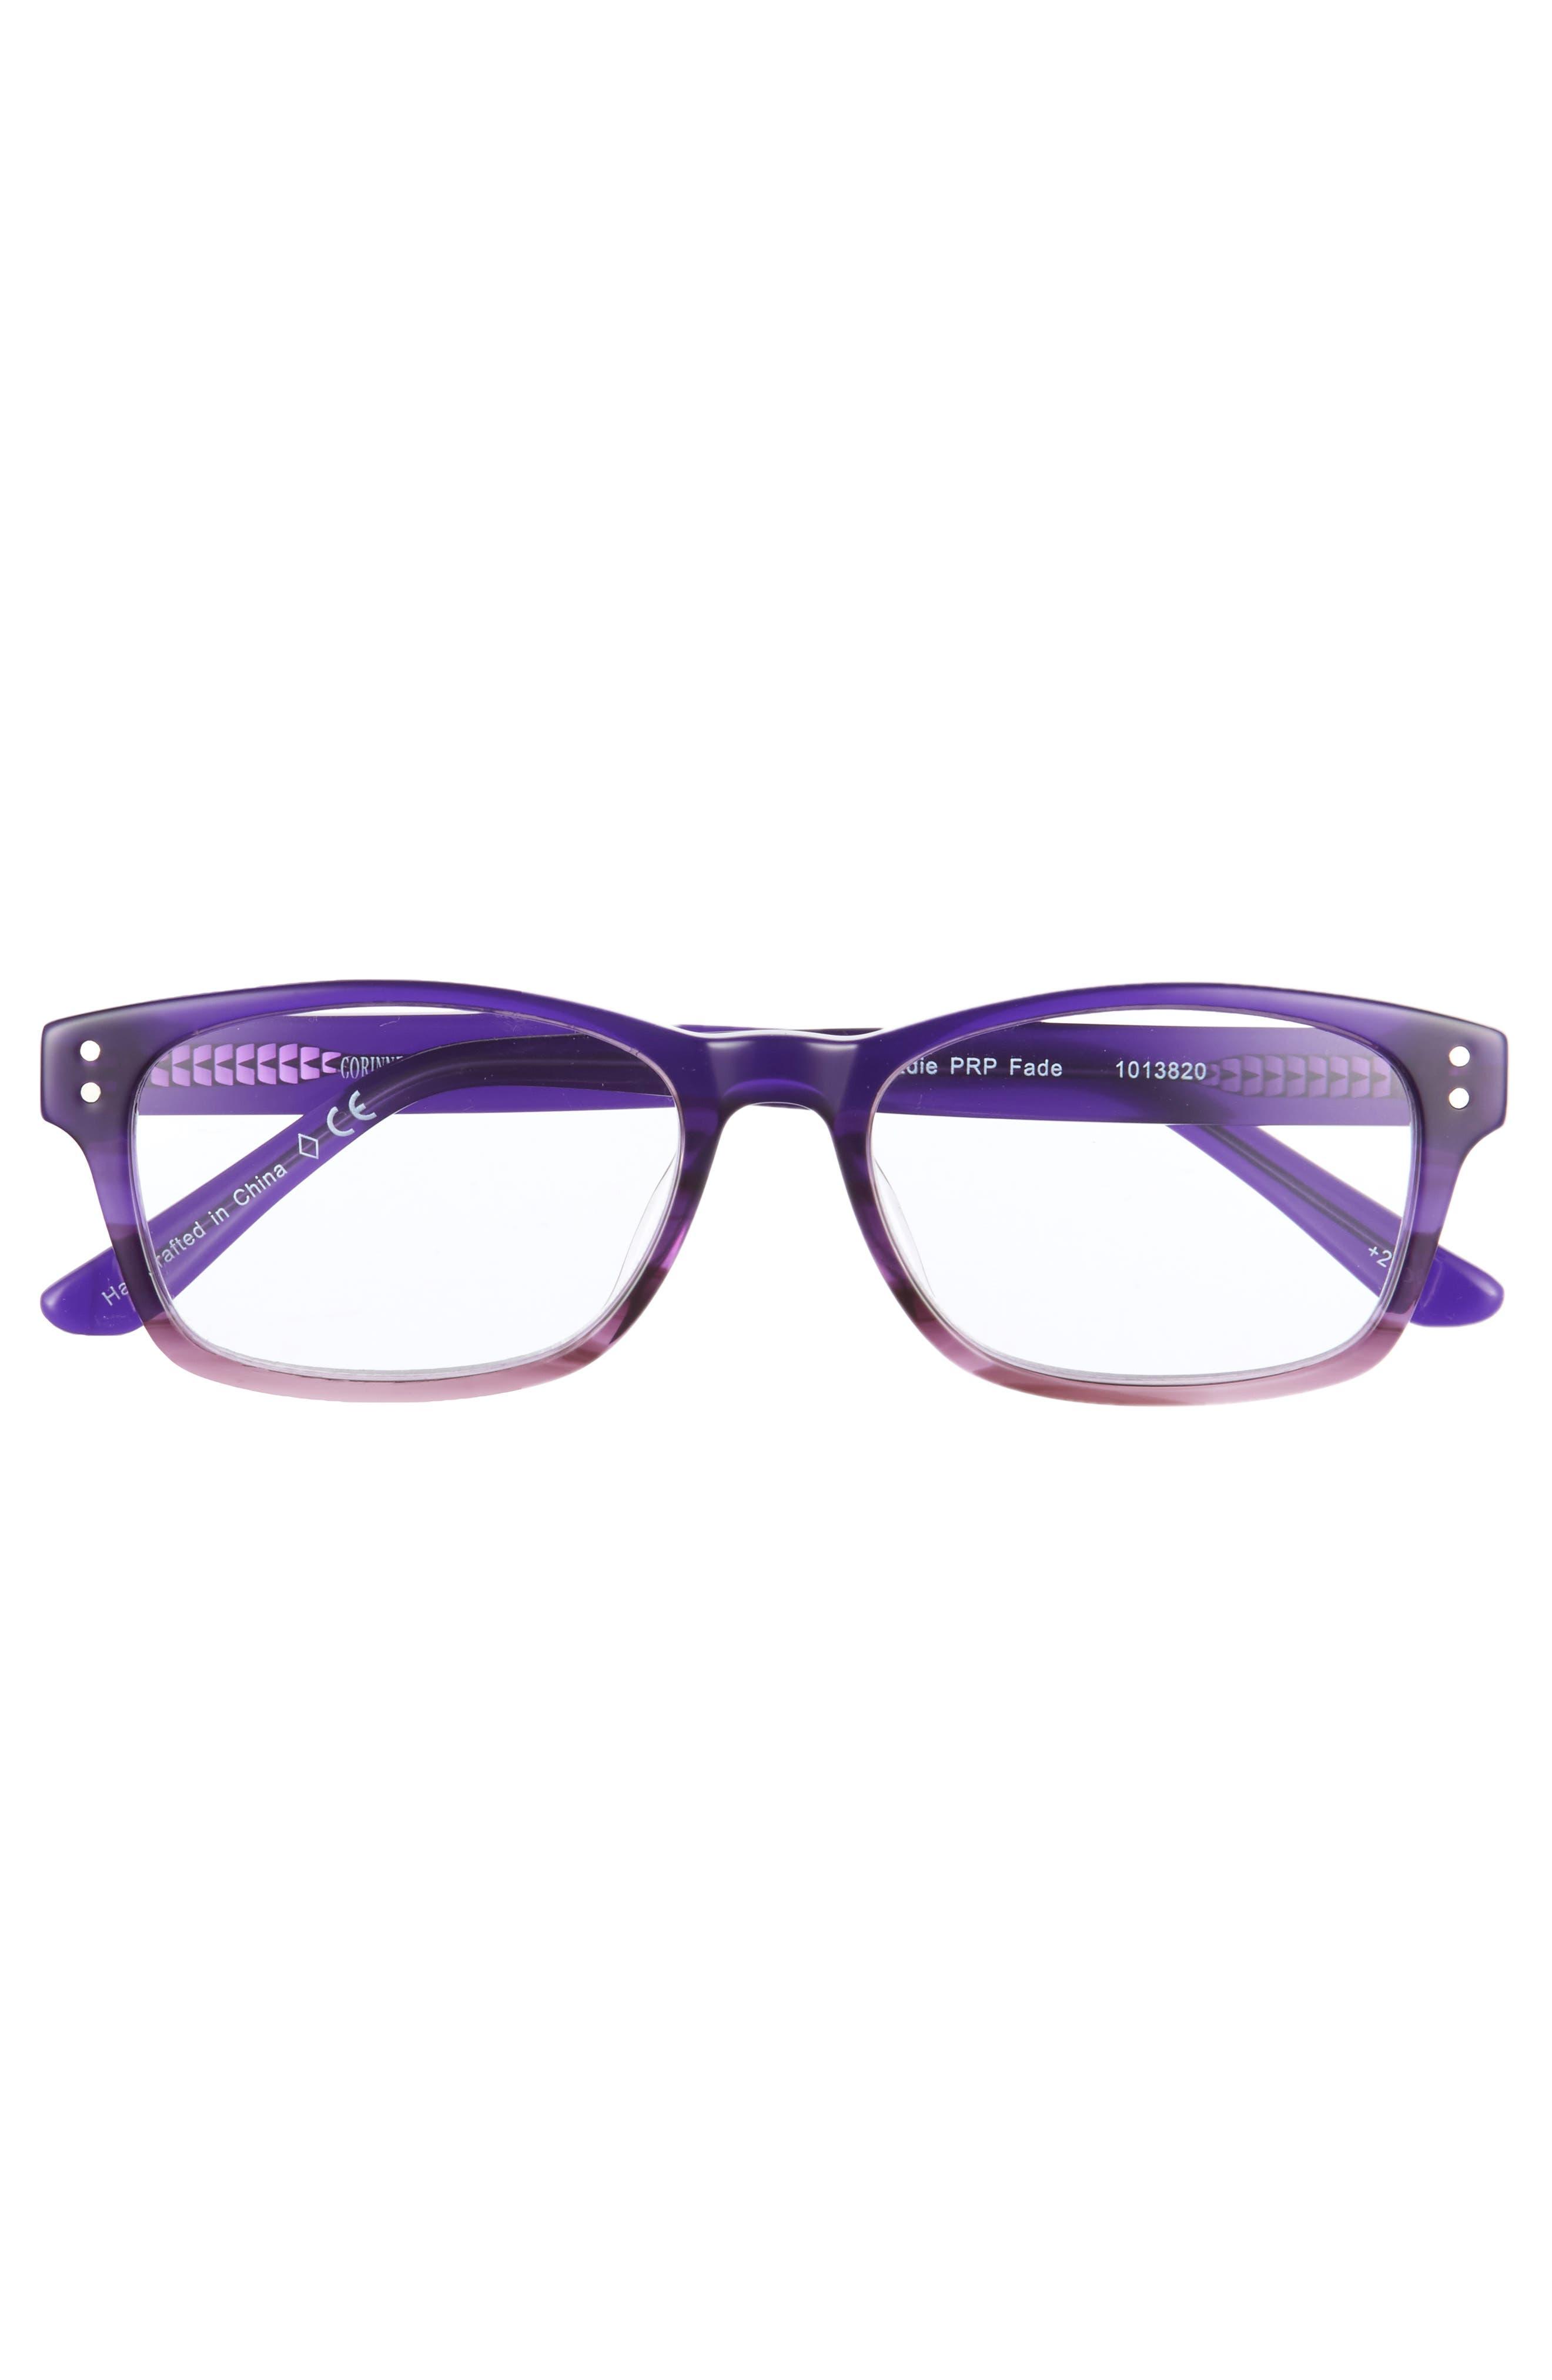 Edie 50mm Reading Glasses,                             Alternate thumbnail 3, color,                             500